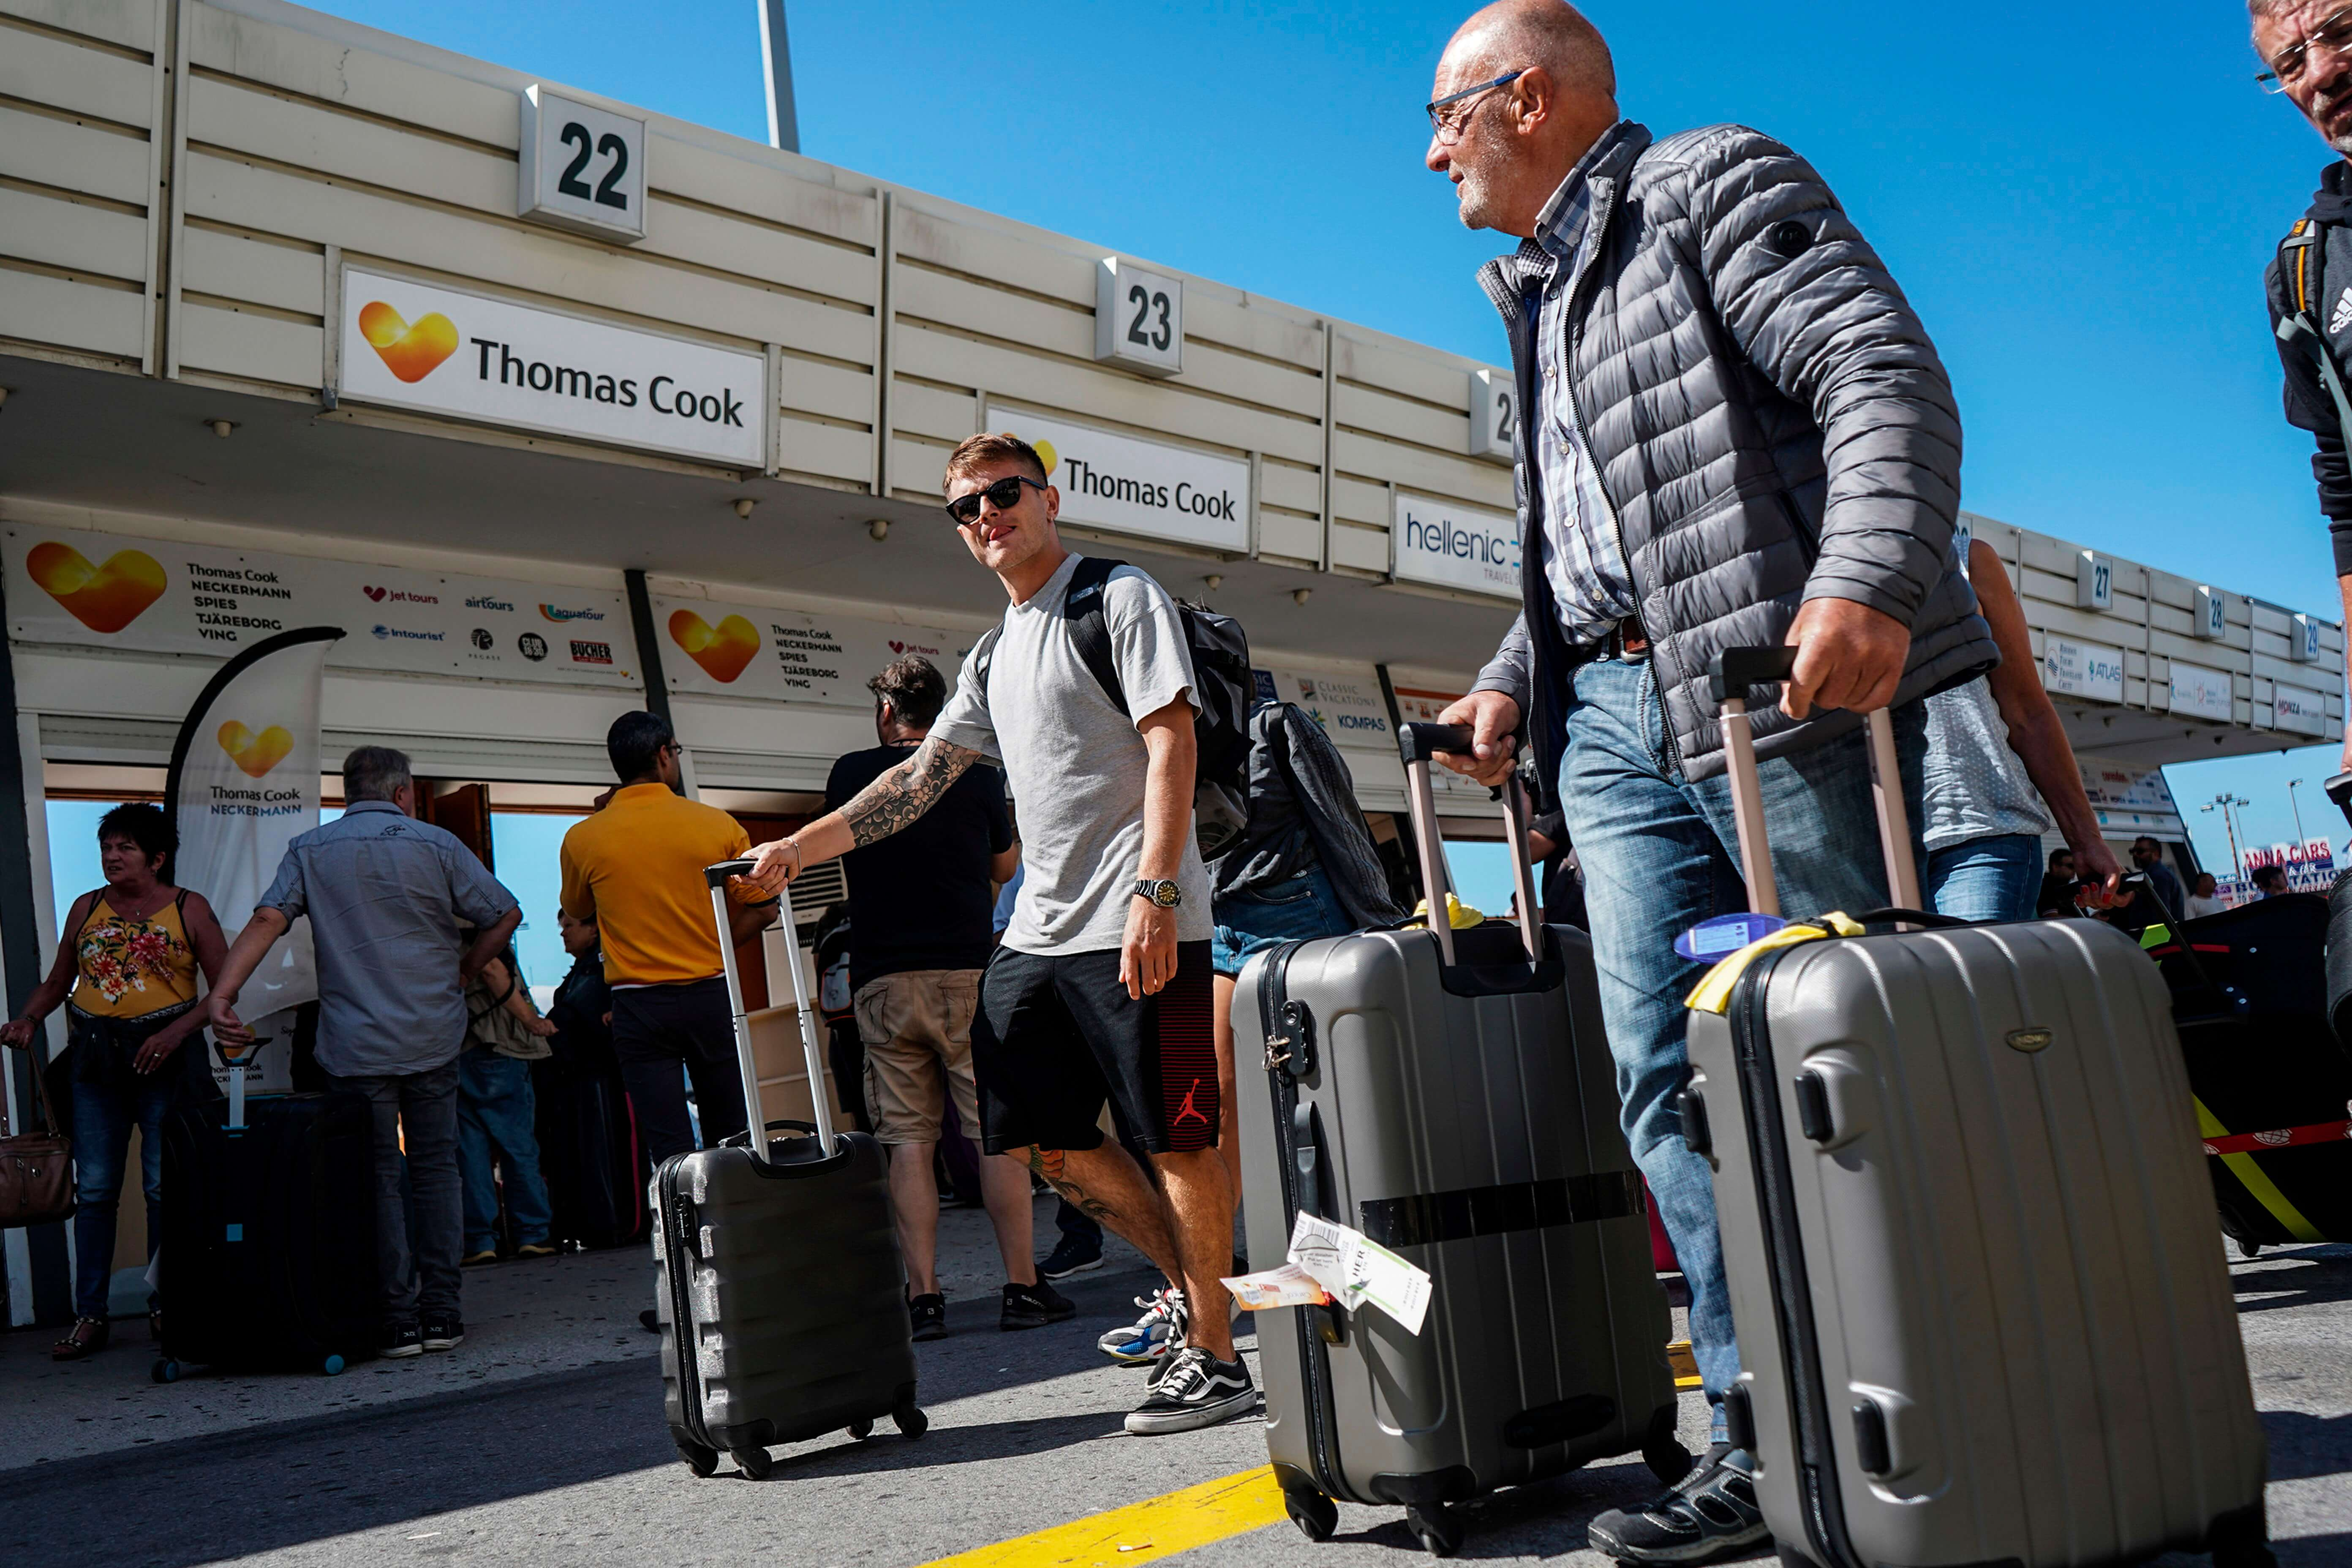 Thomas-Cook-collapses,-stranding-travelers